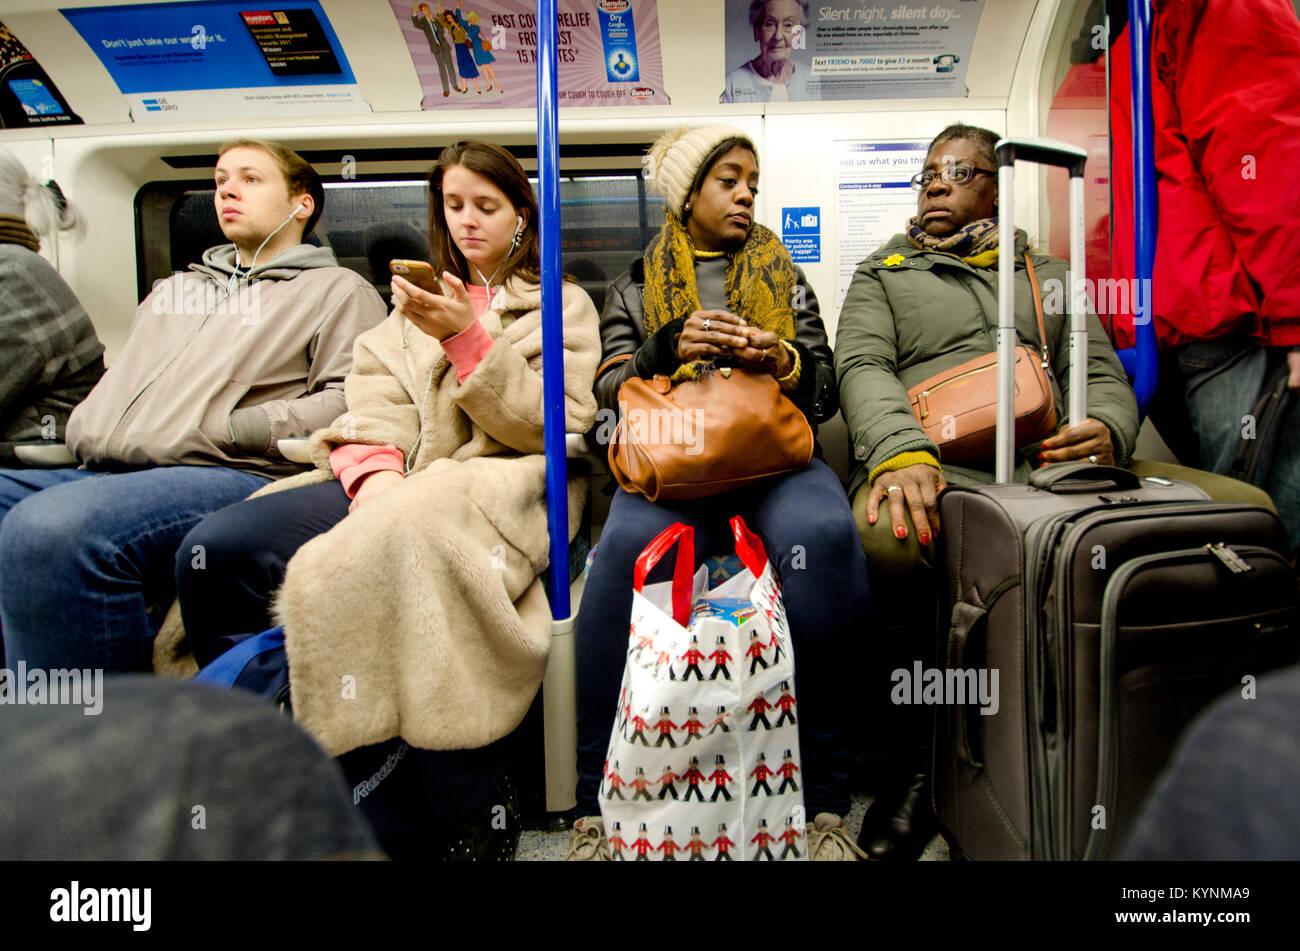 Londres, Inglaterra, Reino Unido. La gente en un tren de metro Imagen De Stock